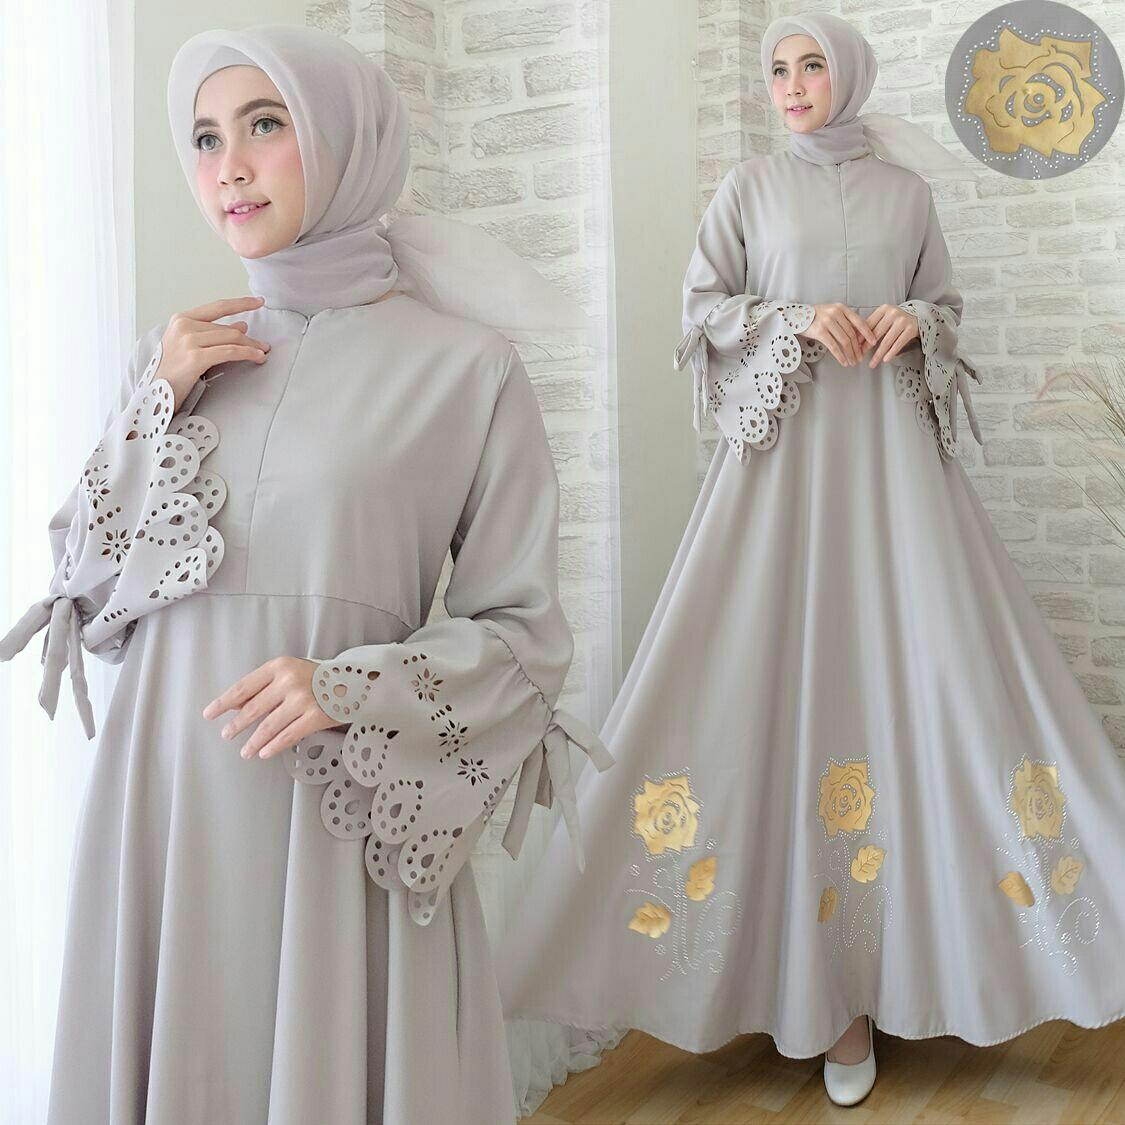 Kelebihan Lonics Gamis Monalisa Fillea Set Syari Busui Mayung Kayla New Baju Muslim Fashion Dress